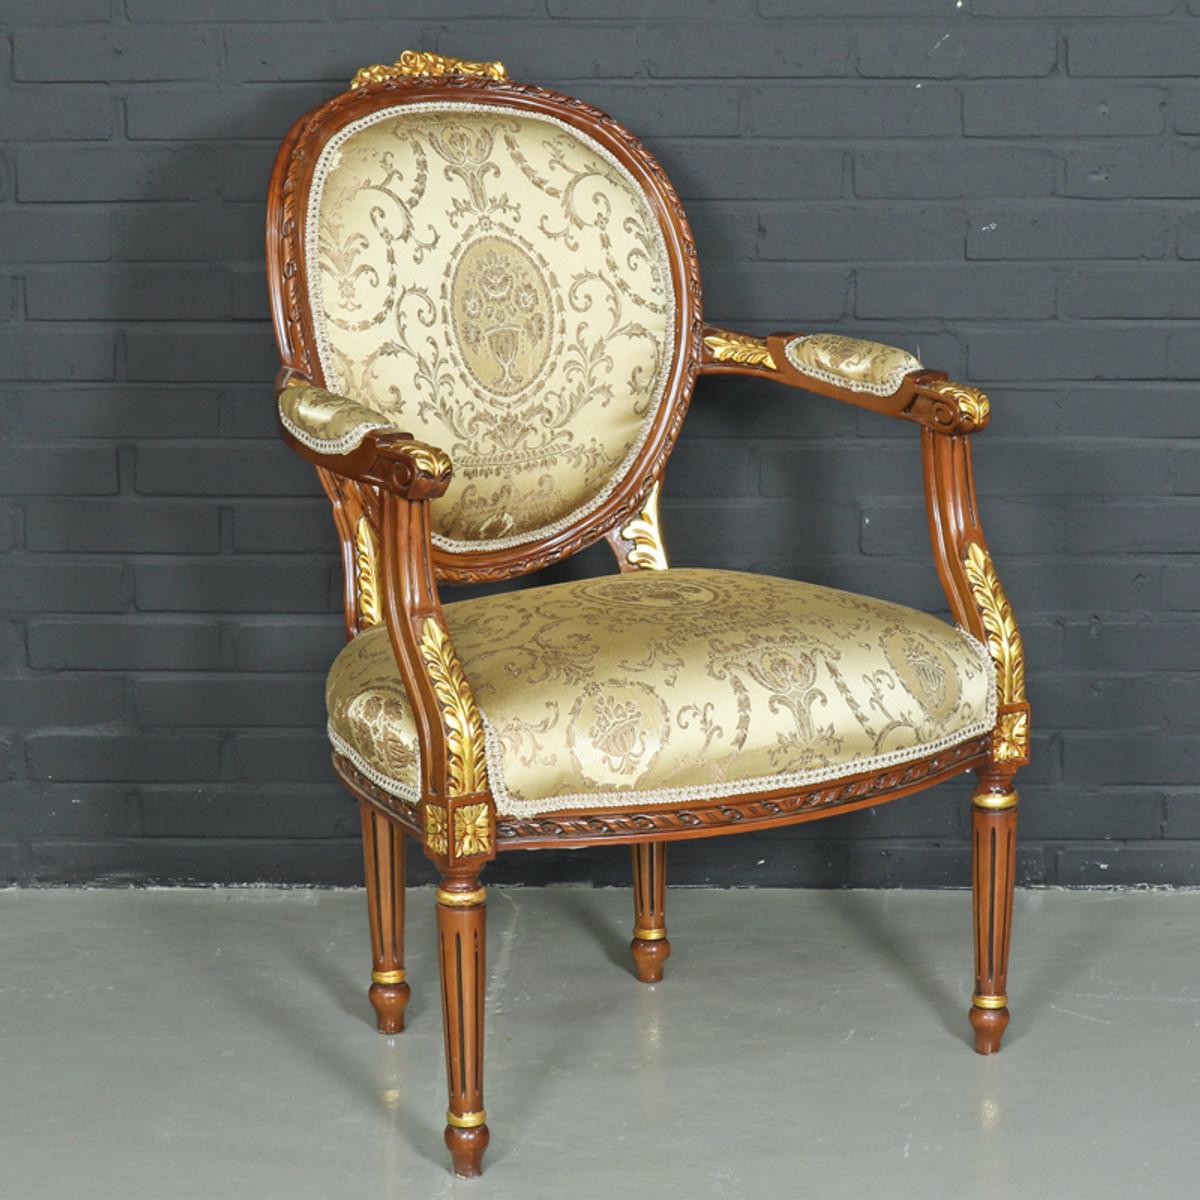 casa padrino barock salon stuhl ludwig xv mit armlehnen 65 x 65 x h 100 cm antikstil stuhl. Black Bedroom Furniture Sets. Home Design Ideas